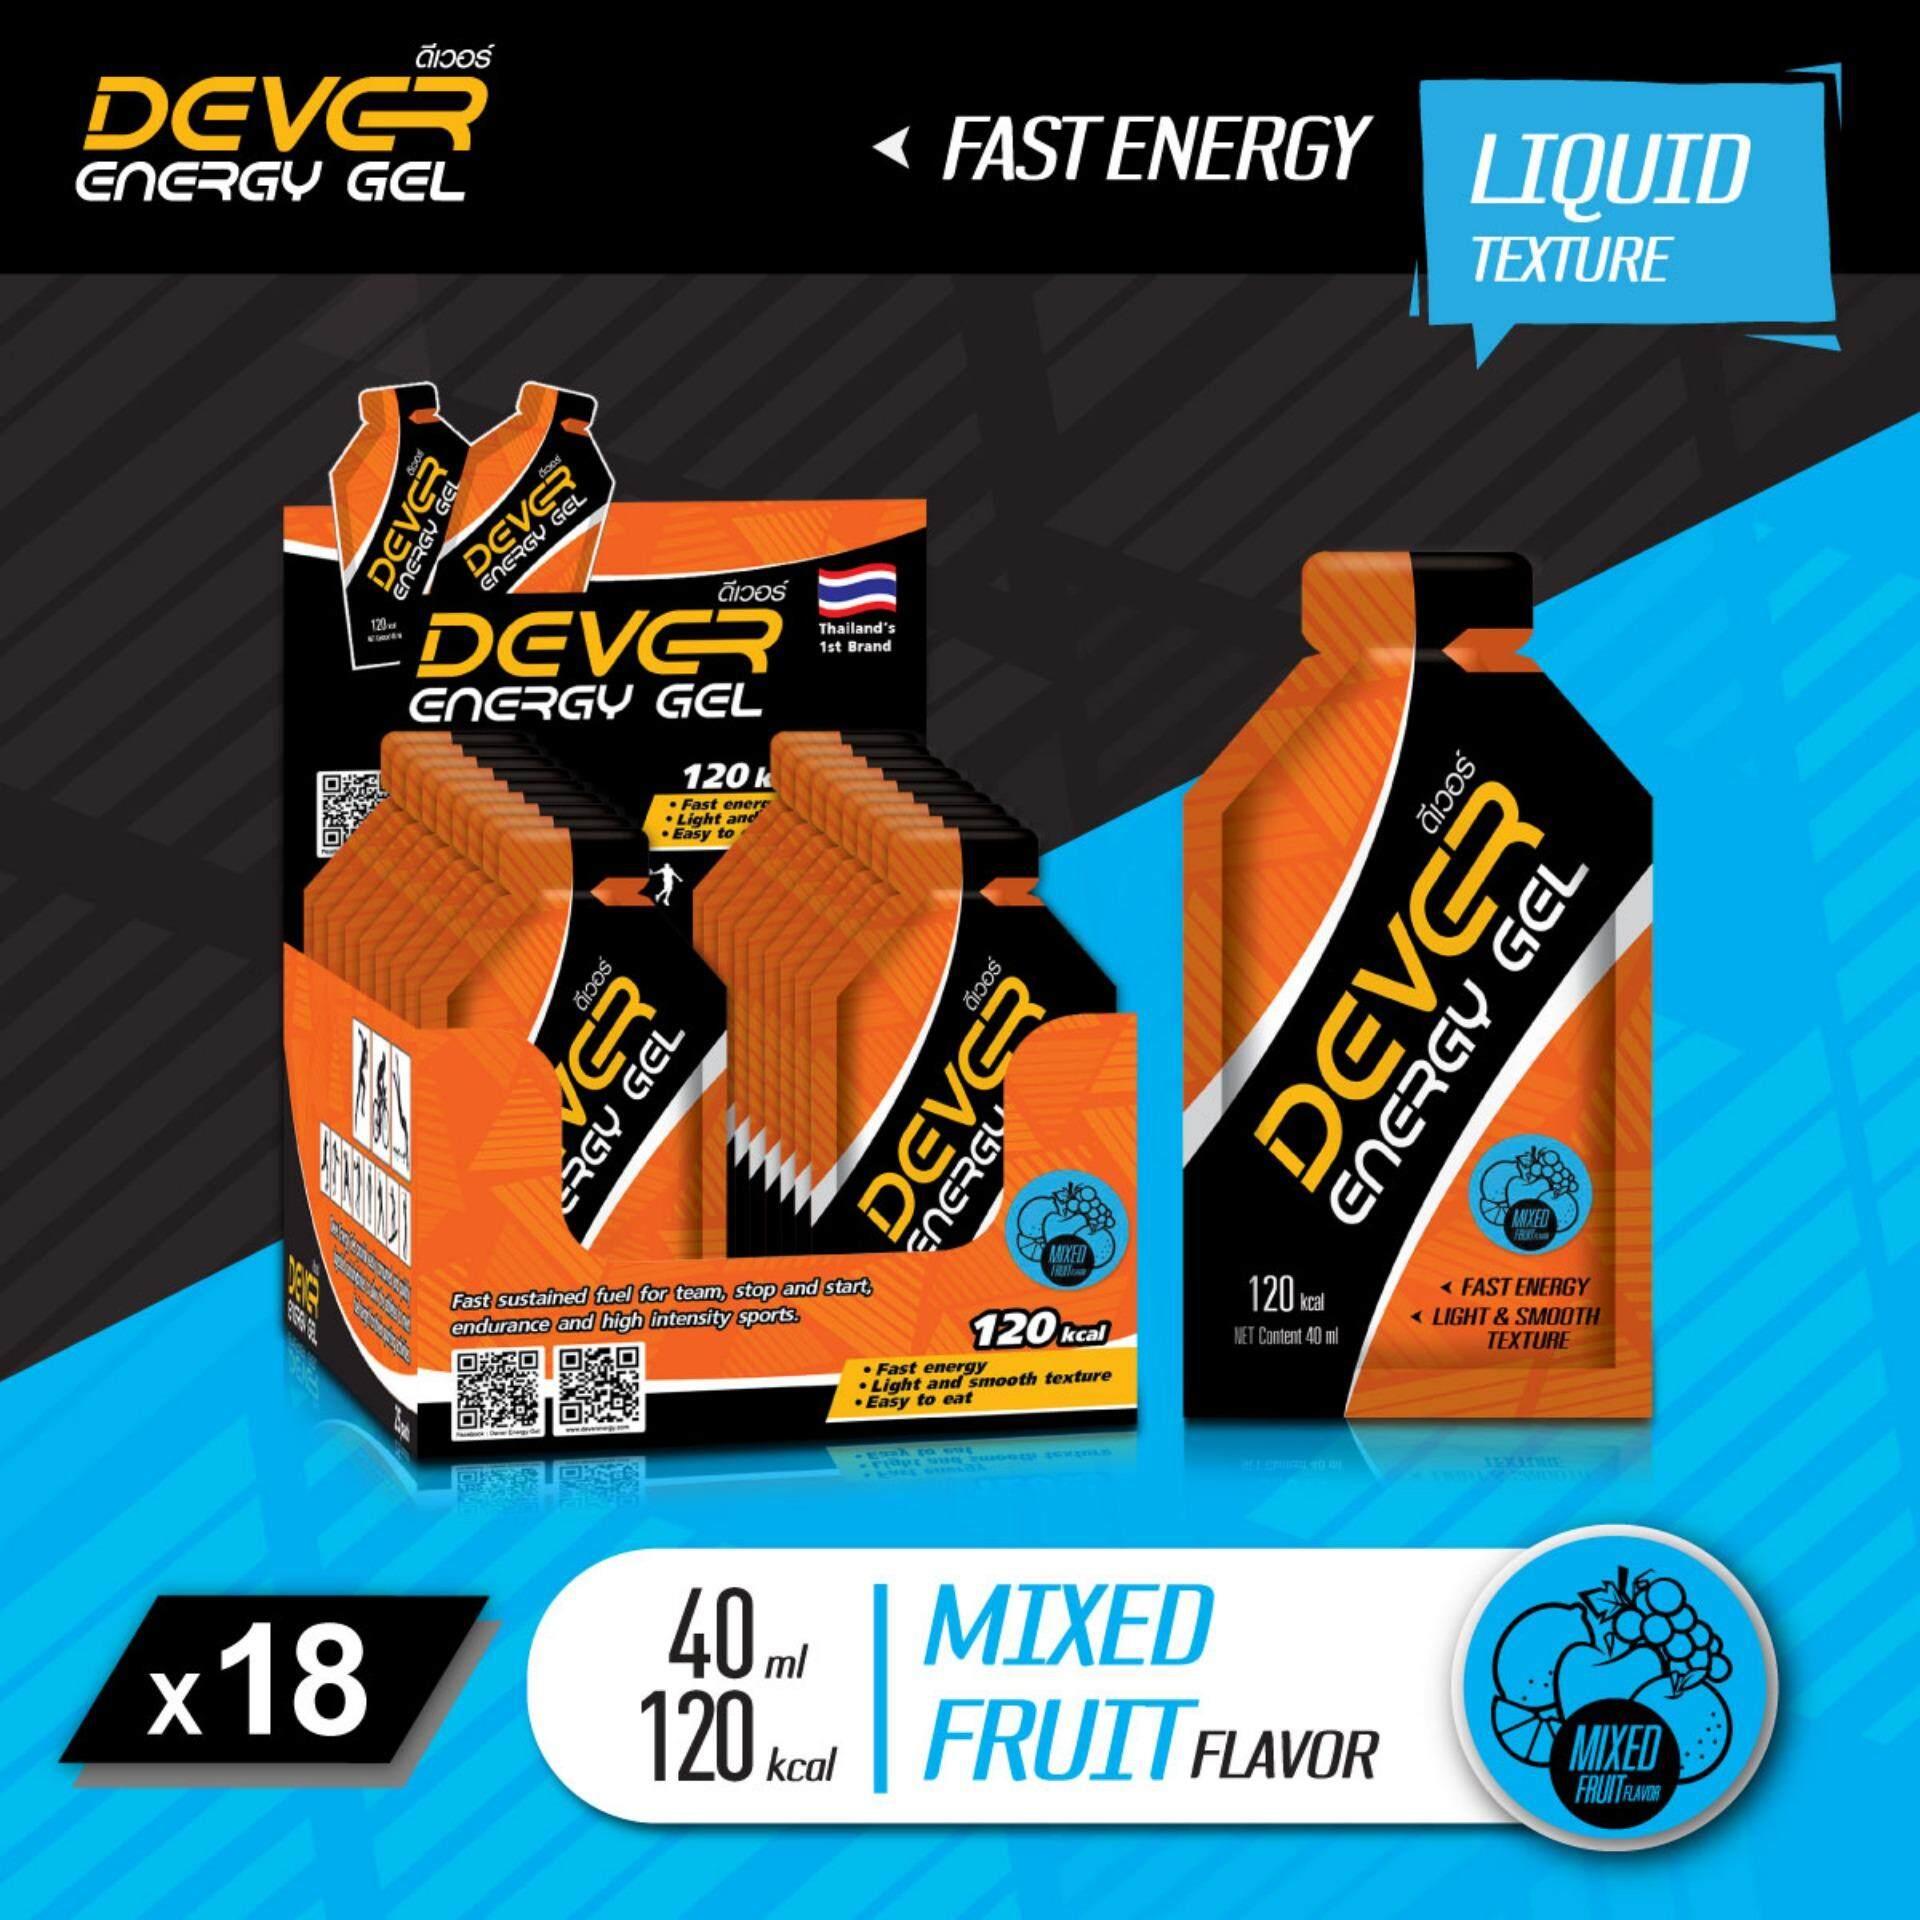 DEVER เจลให้พลังงาน สำหรับนักกีฬา รสผลไม้รวม 40 ml แพค 18 ซอง